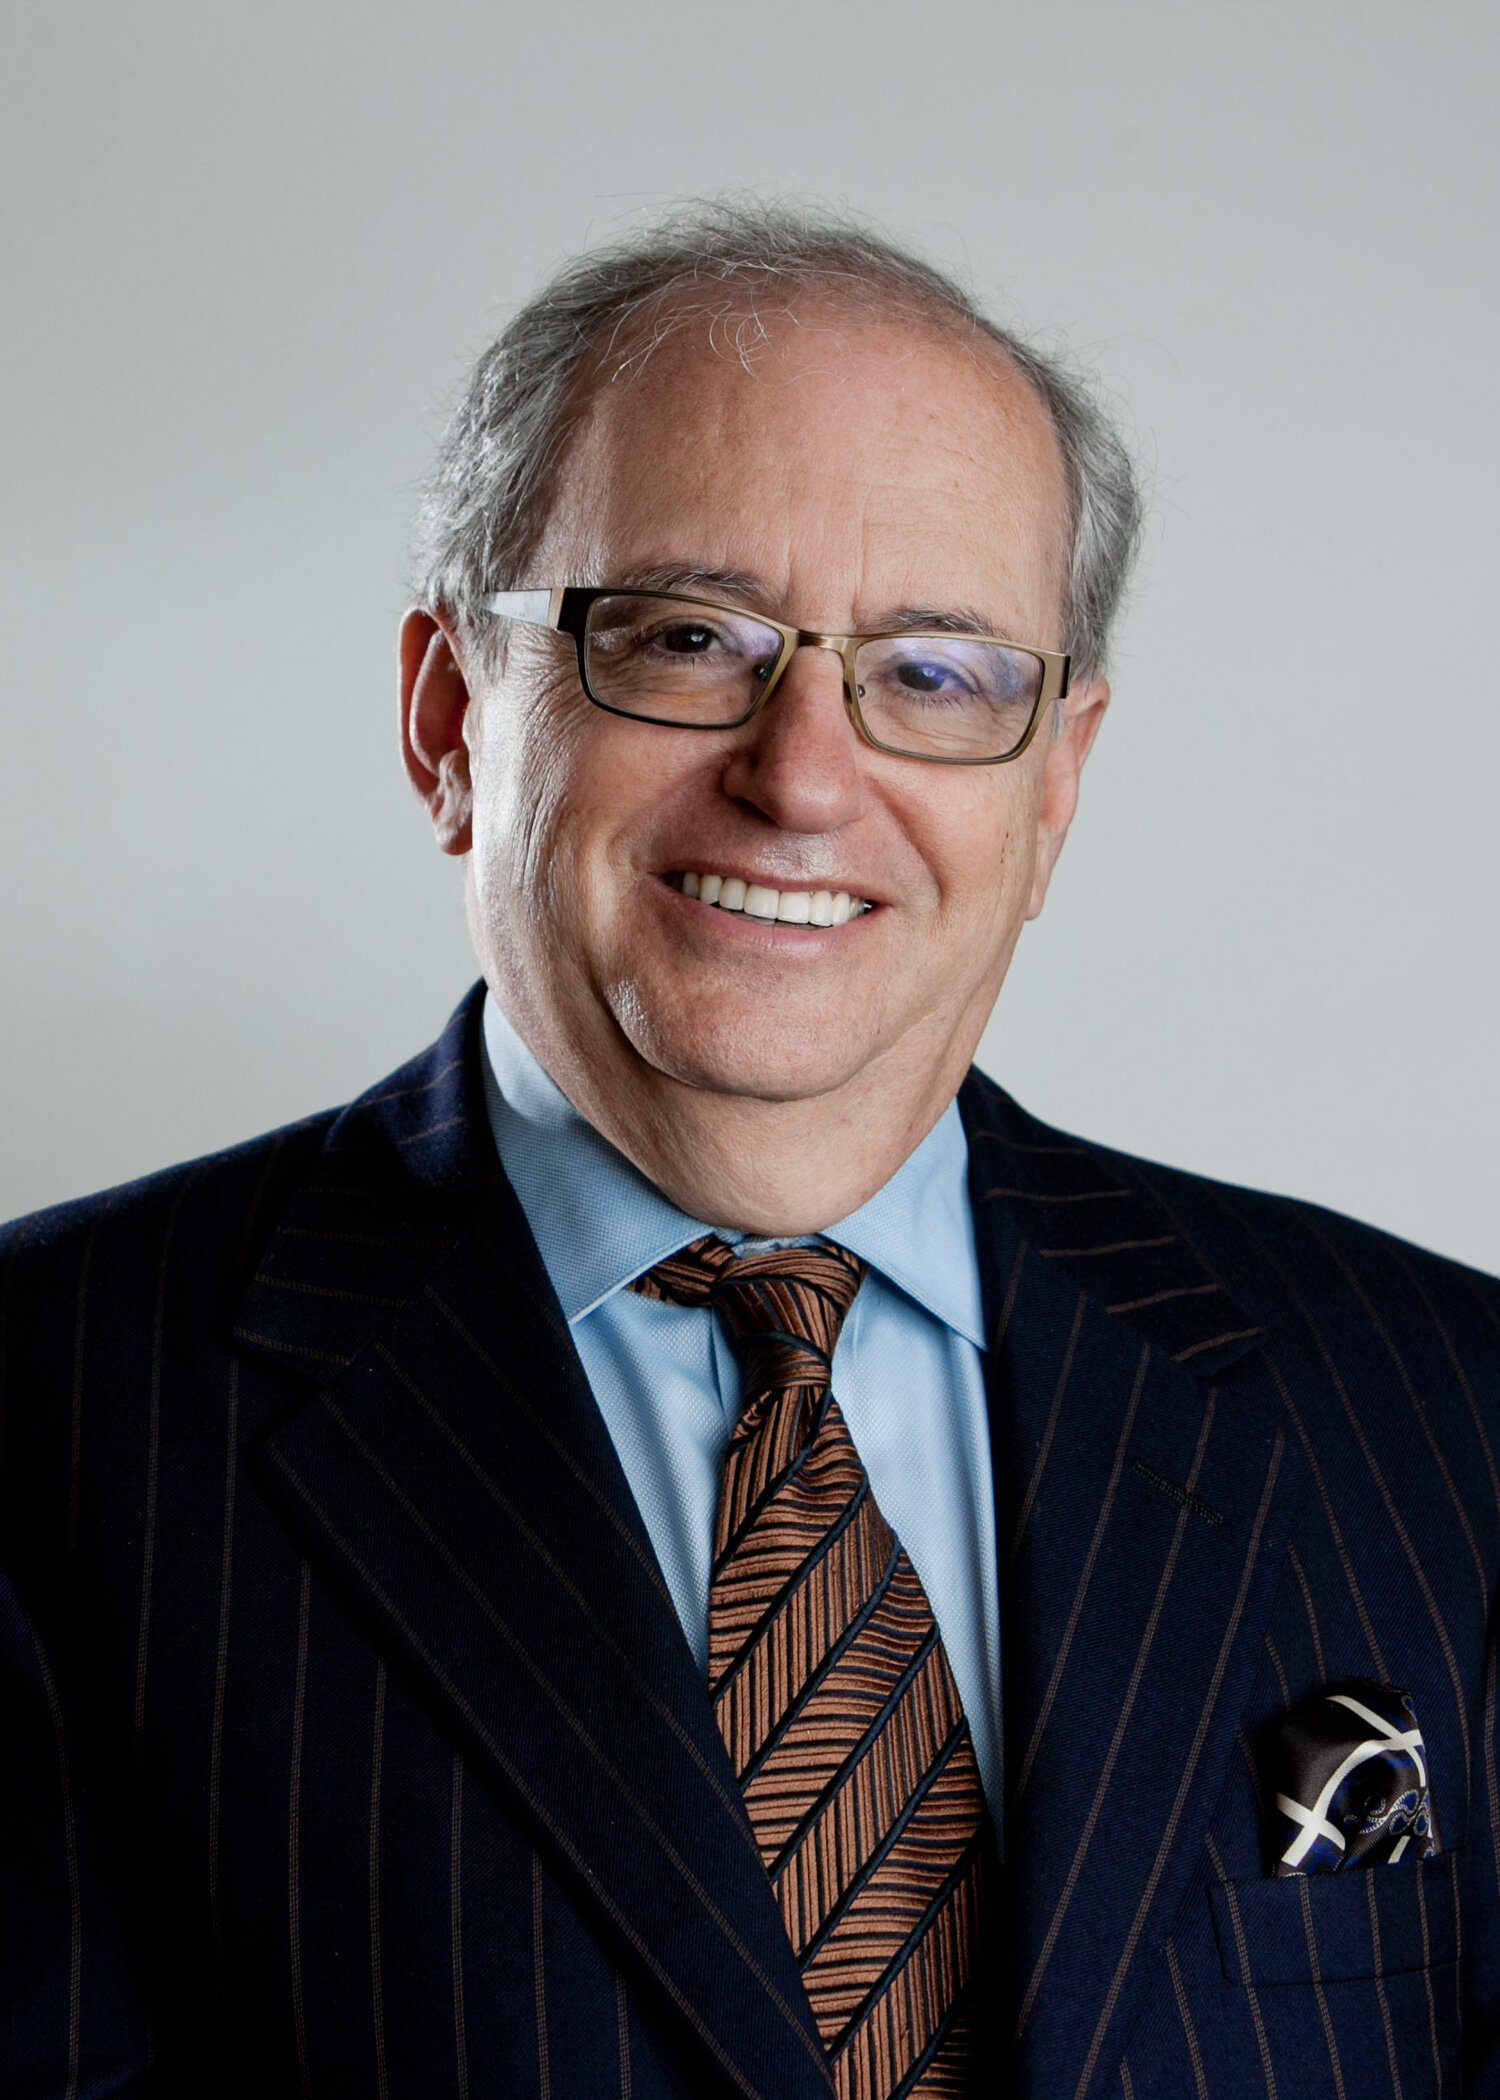 Norm Ornstein, Resident Scholar - American Enterprise Institute